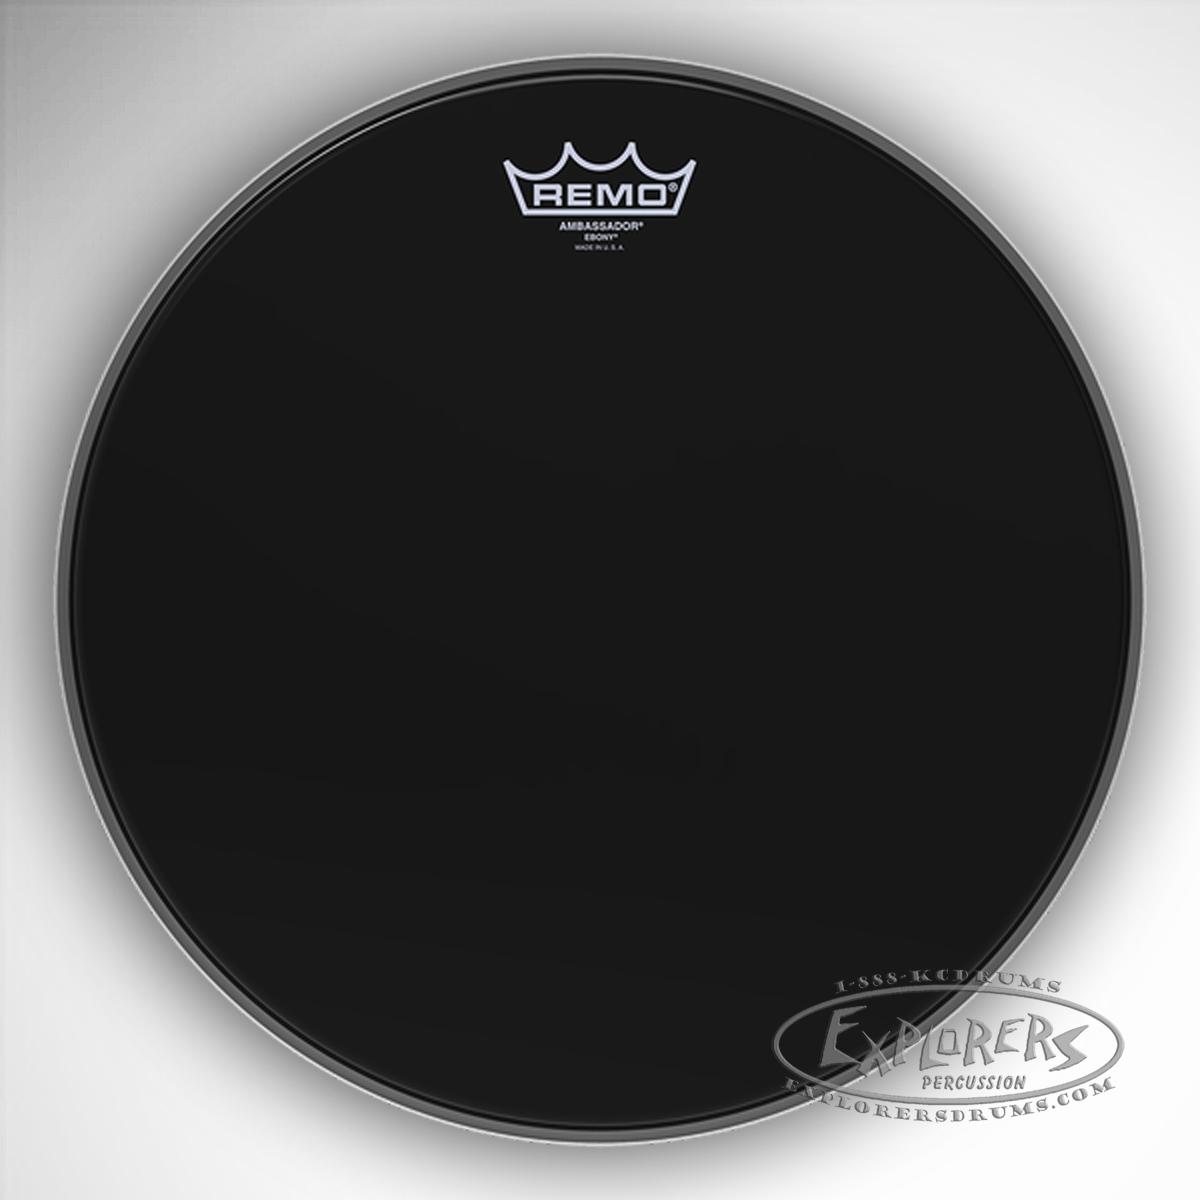 remo ambassador ebony batter resonant bass drum head. Black Bedroom Furniture Sets. Home Design Ideas